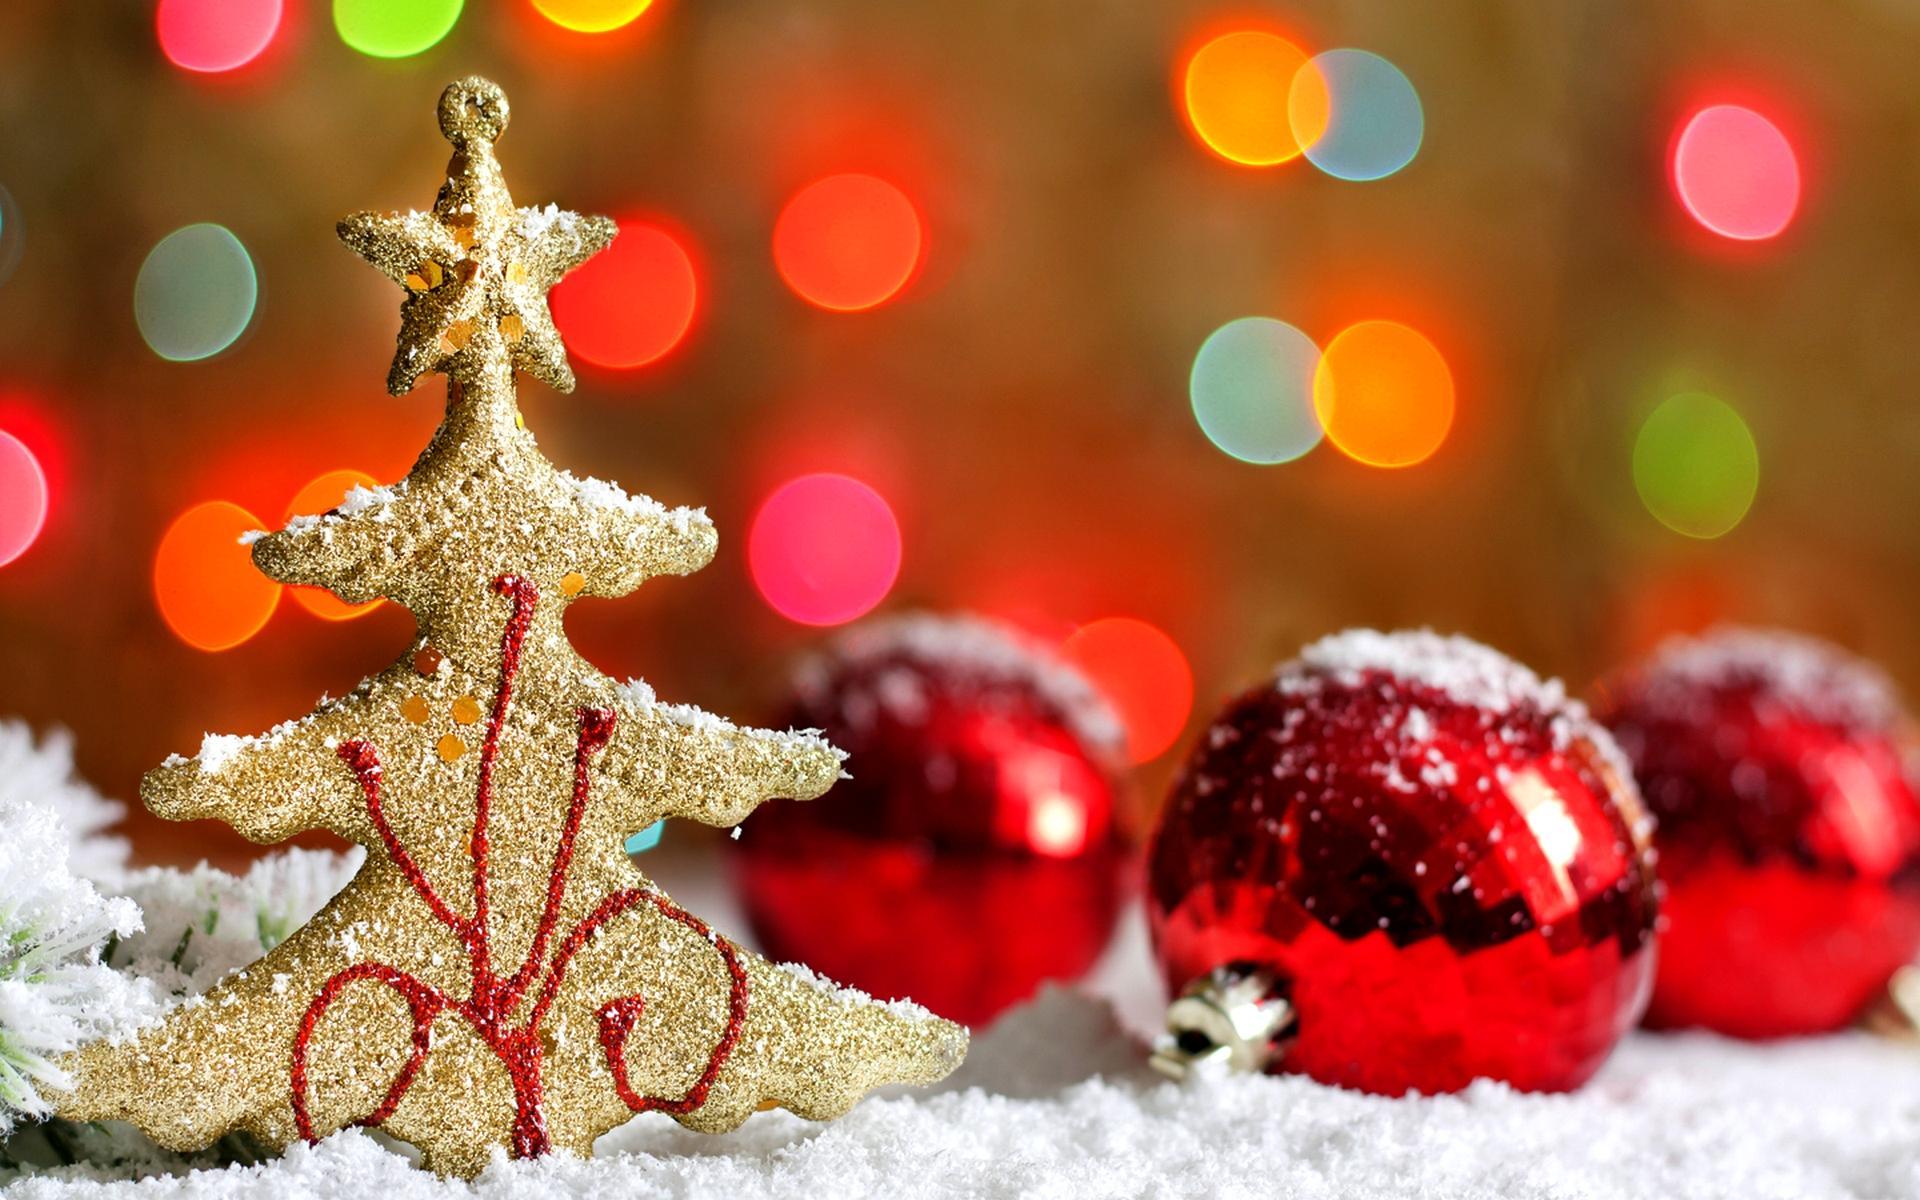 Download Holiday HD Wallpapers Free | PixelsTalk Net